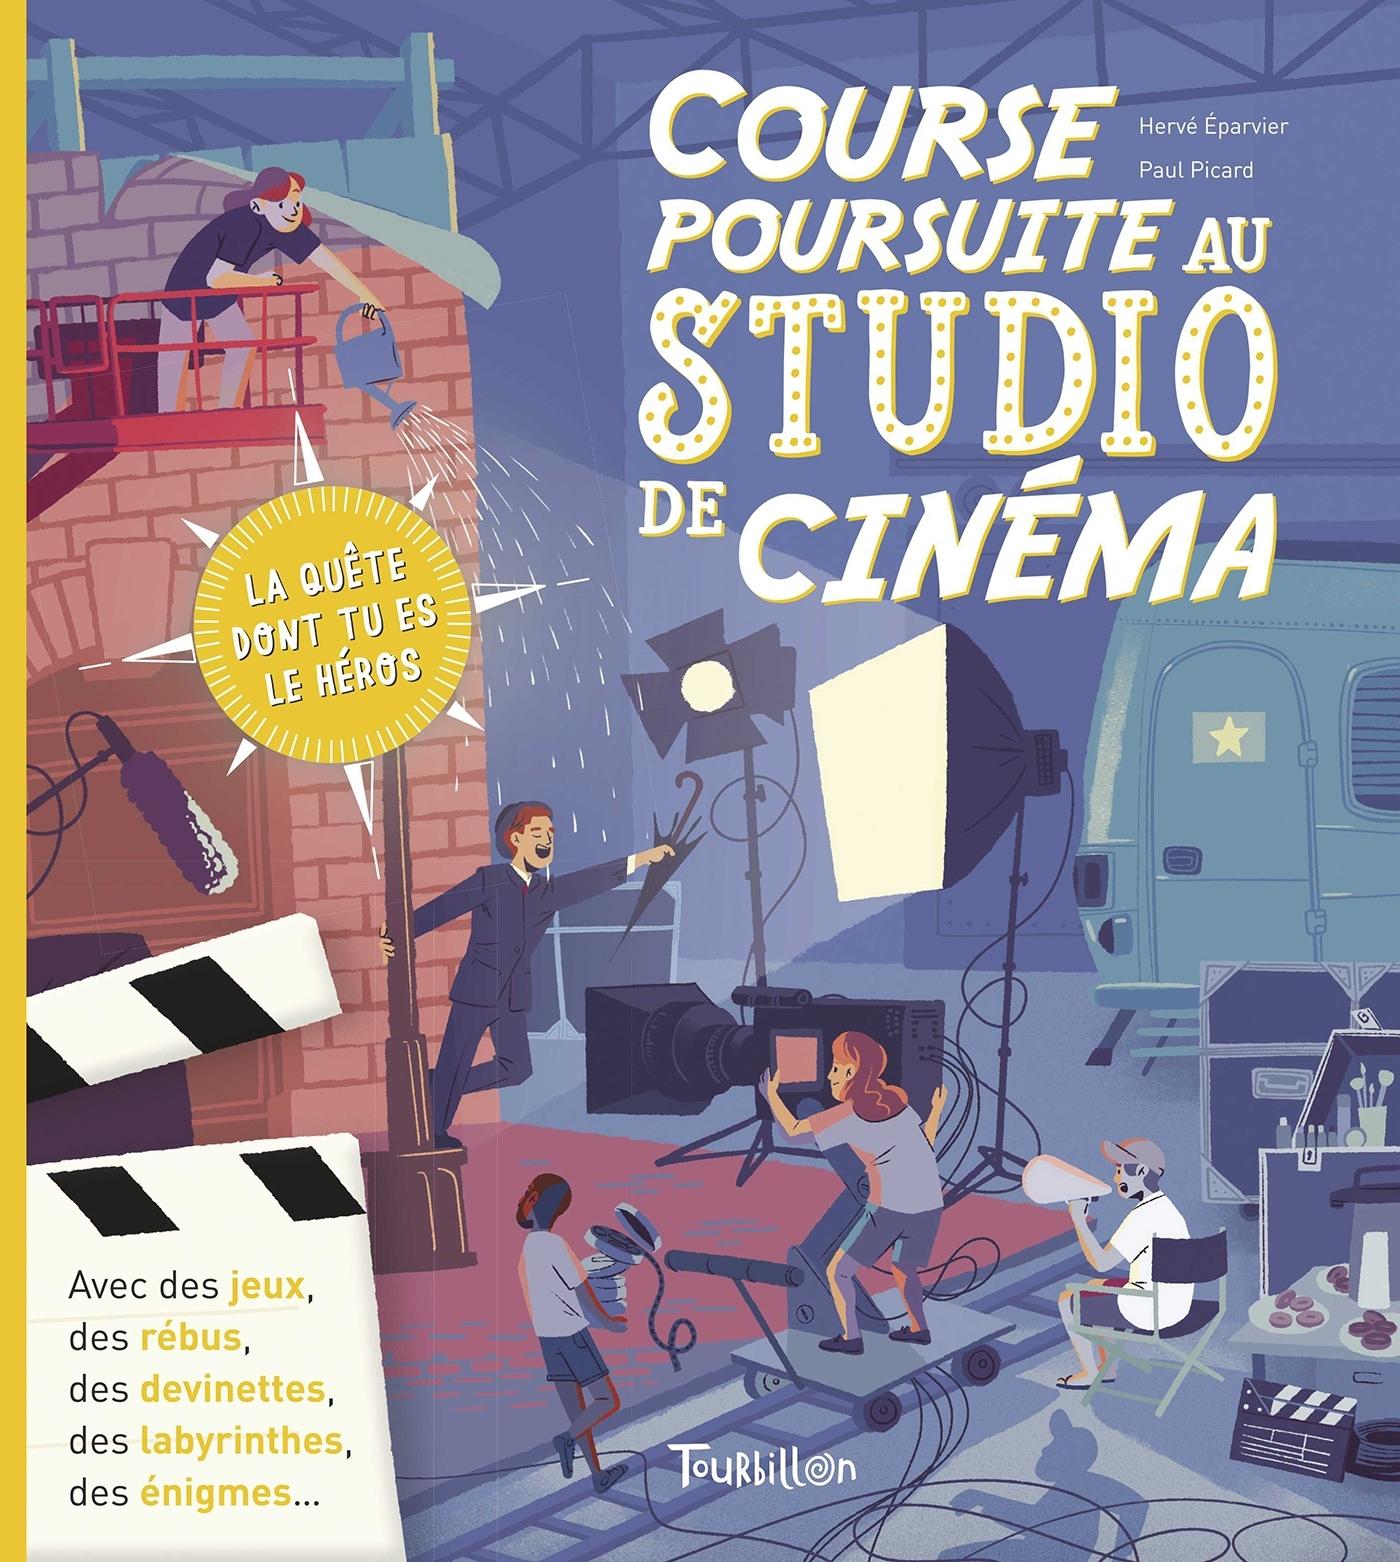 COURSE POURSUITE AU STUDIO DE CINEMA